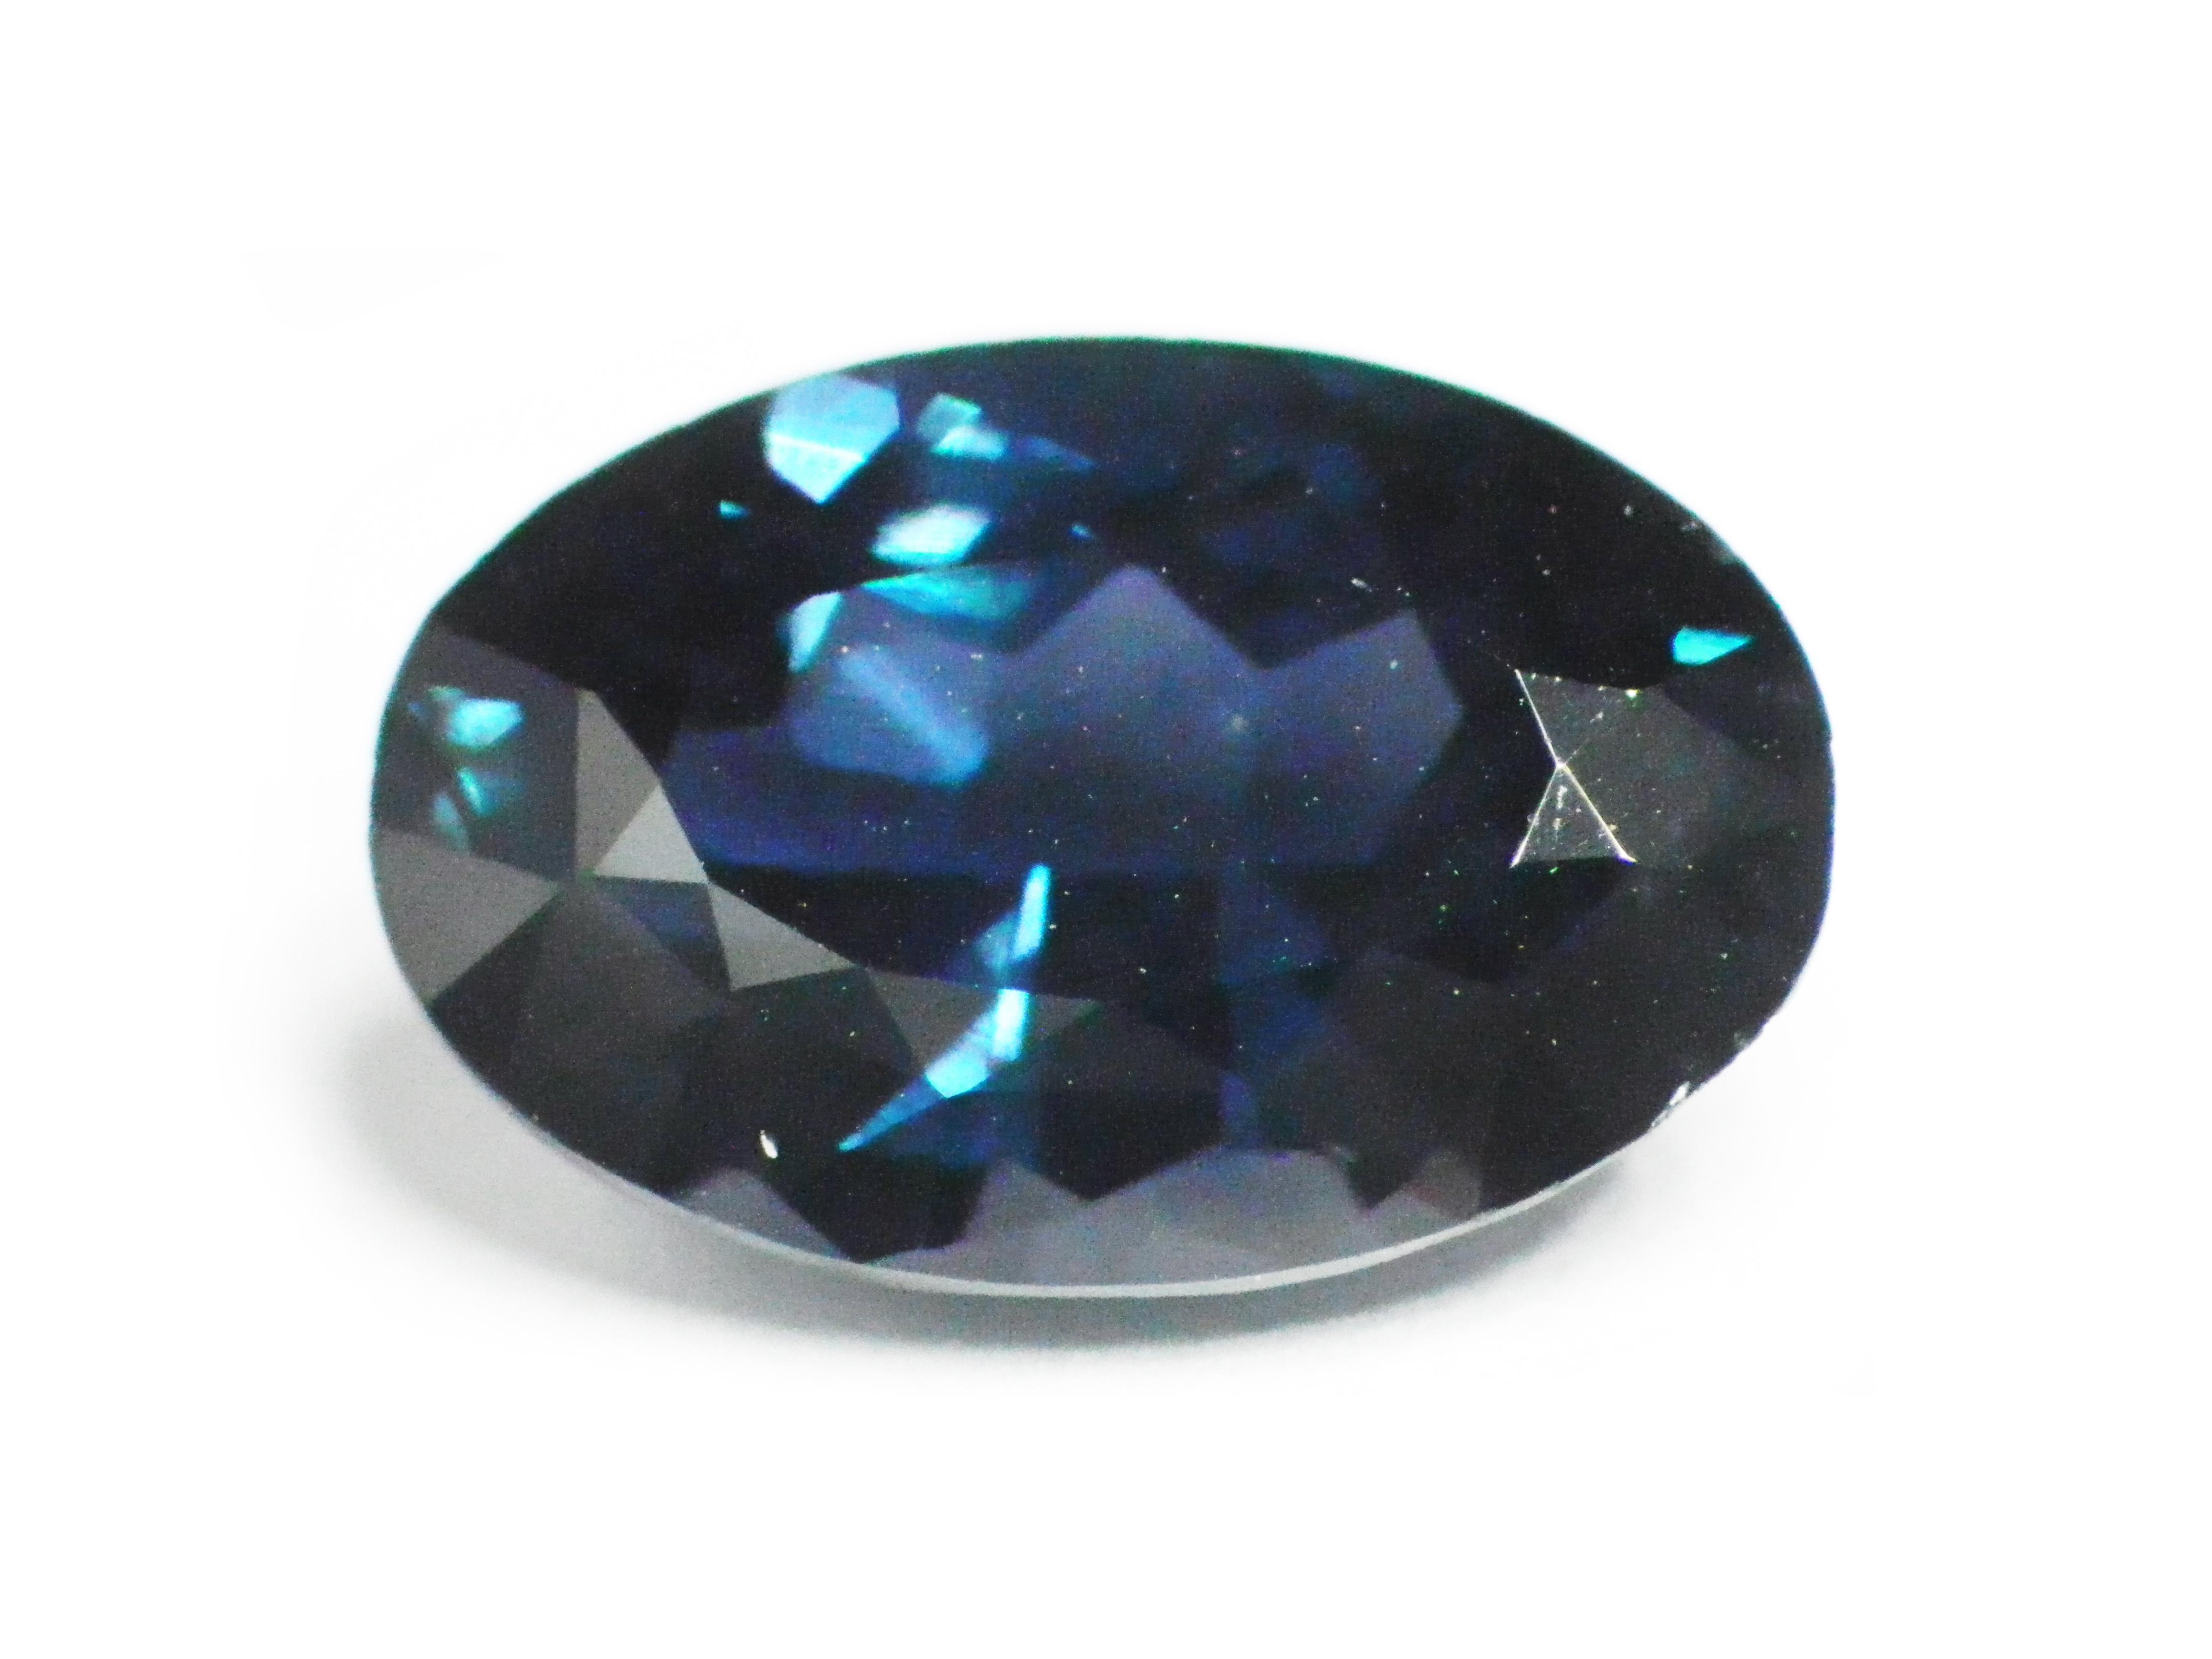 bbfa6d42c592c BLUE SAPPHIRE DEEP BLUE 2.24 CTS - NATURAL SRI LANKA GEMSTONE ...